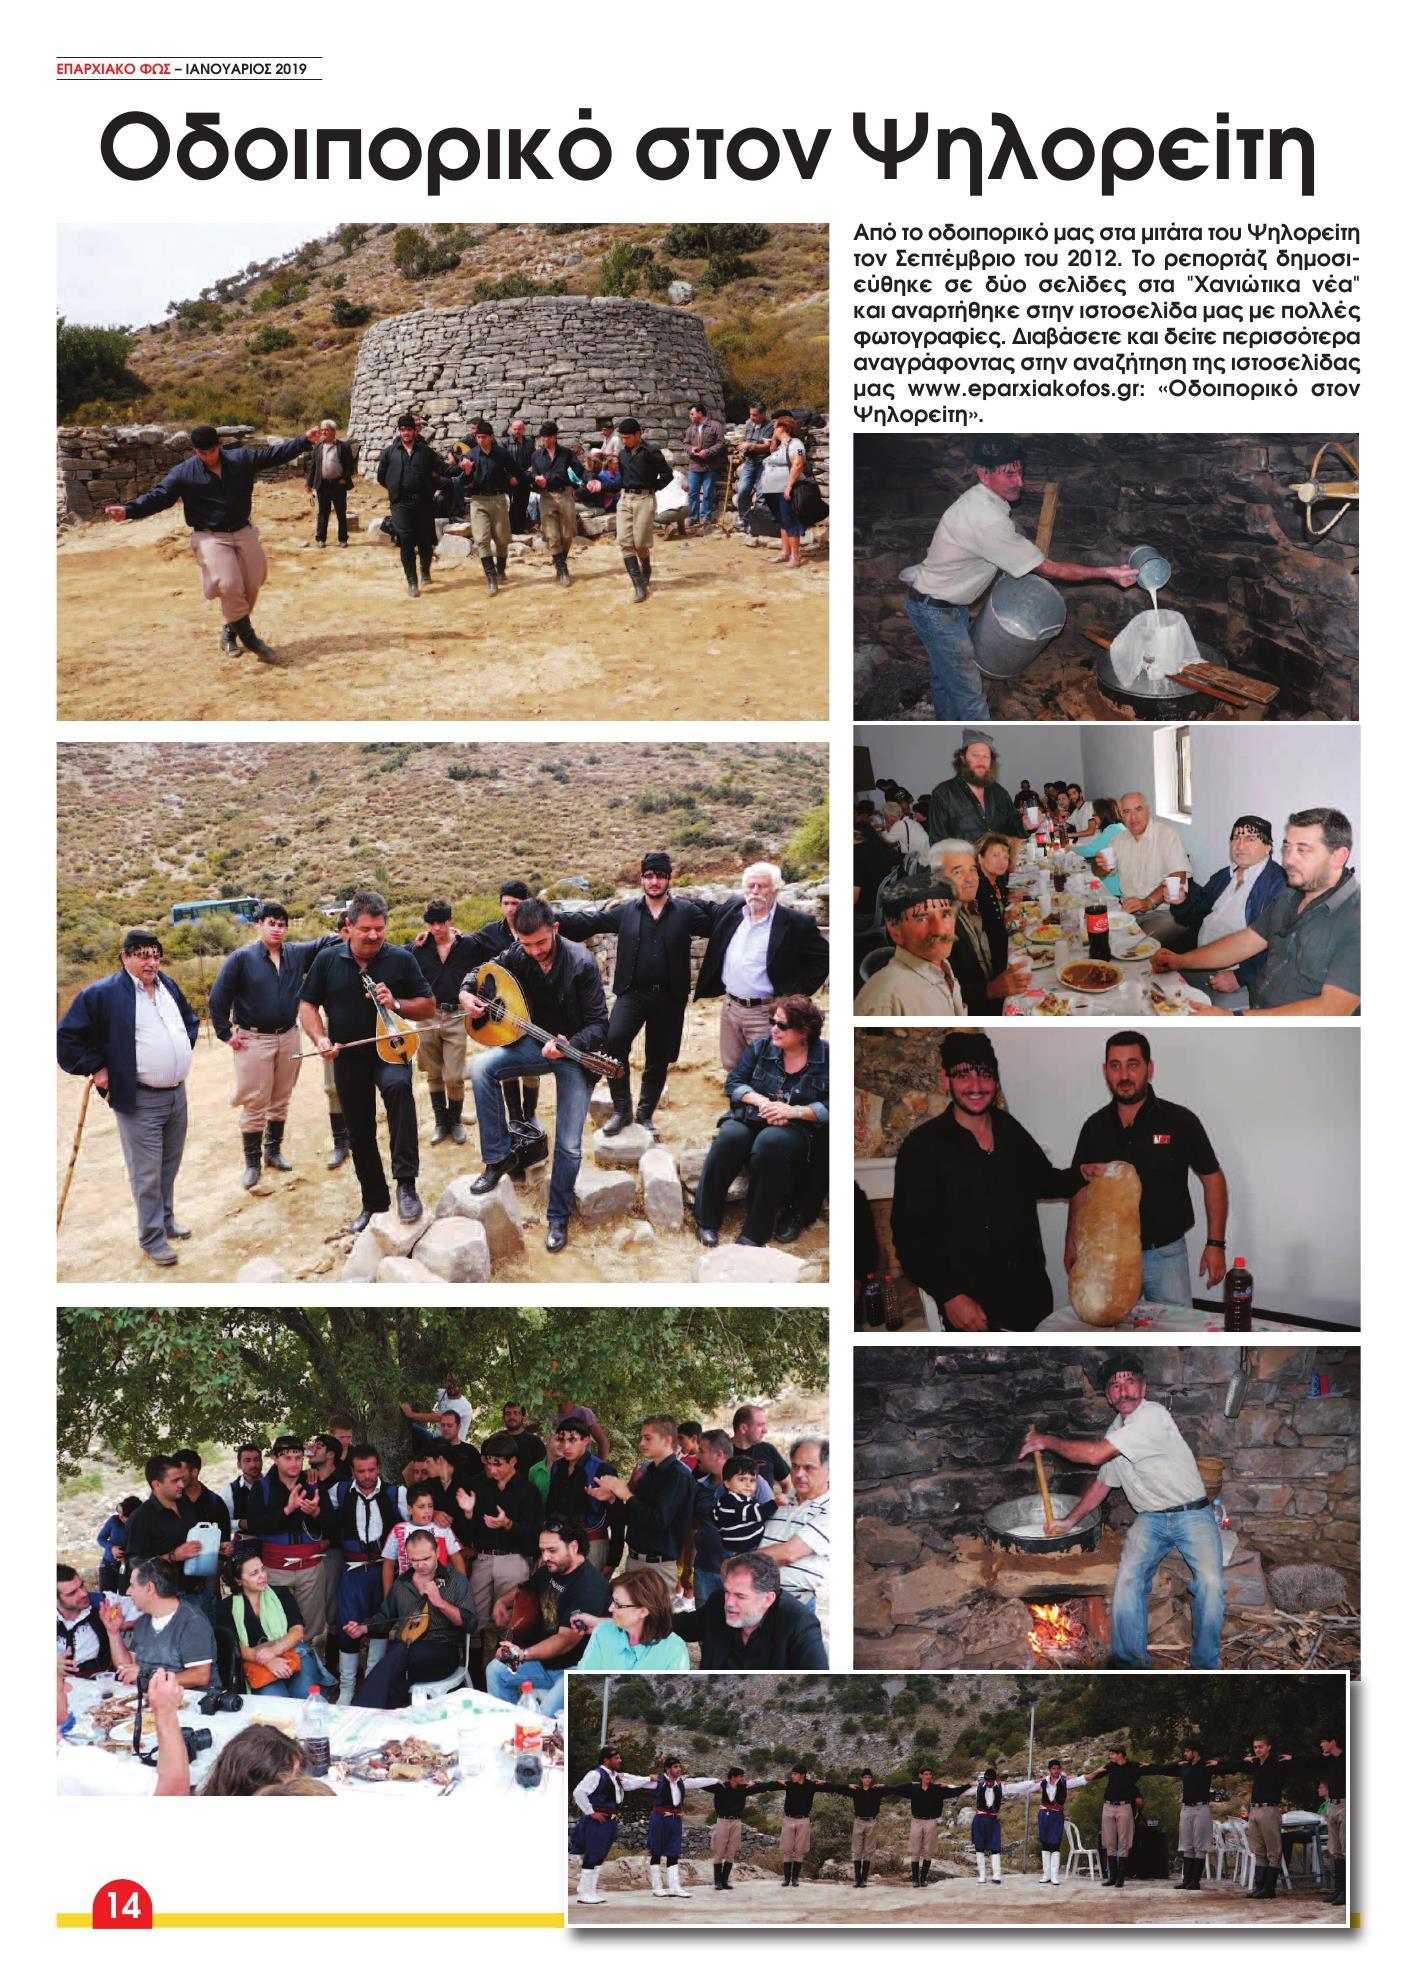 23 KAKANOULHS (Page 14)